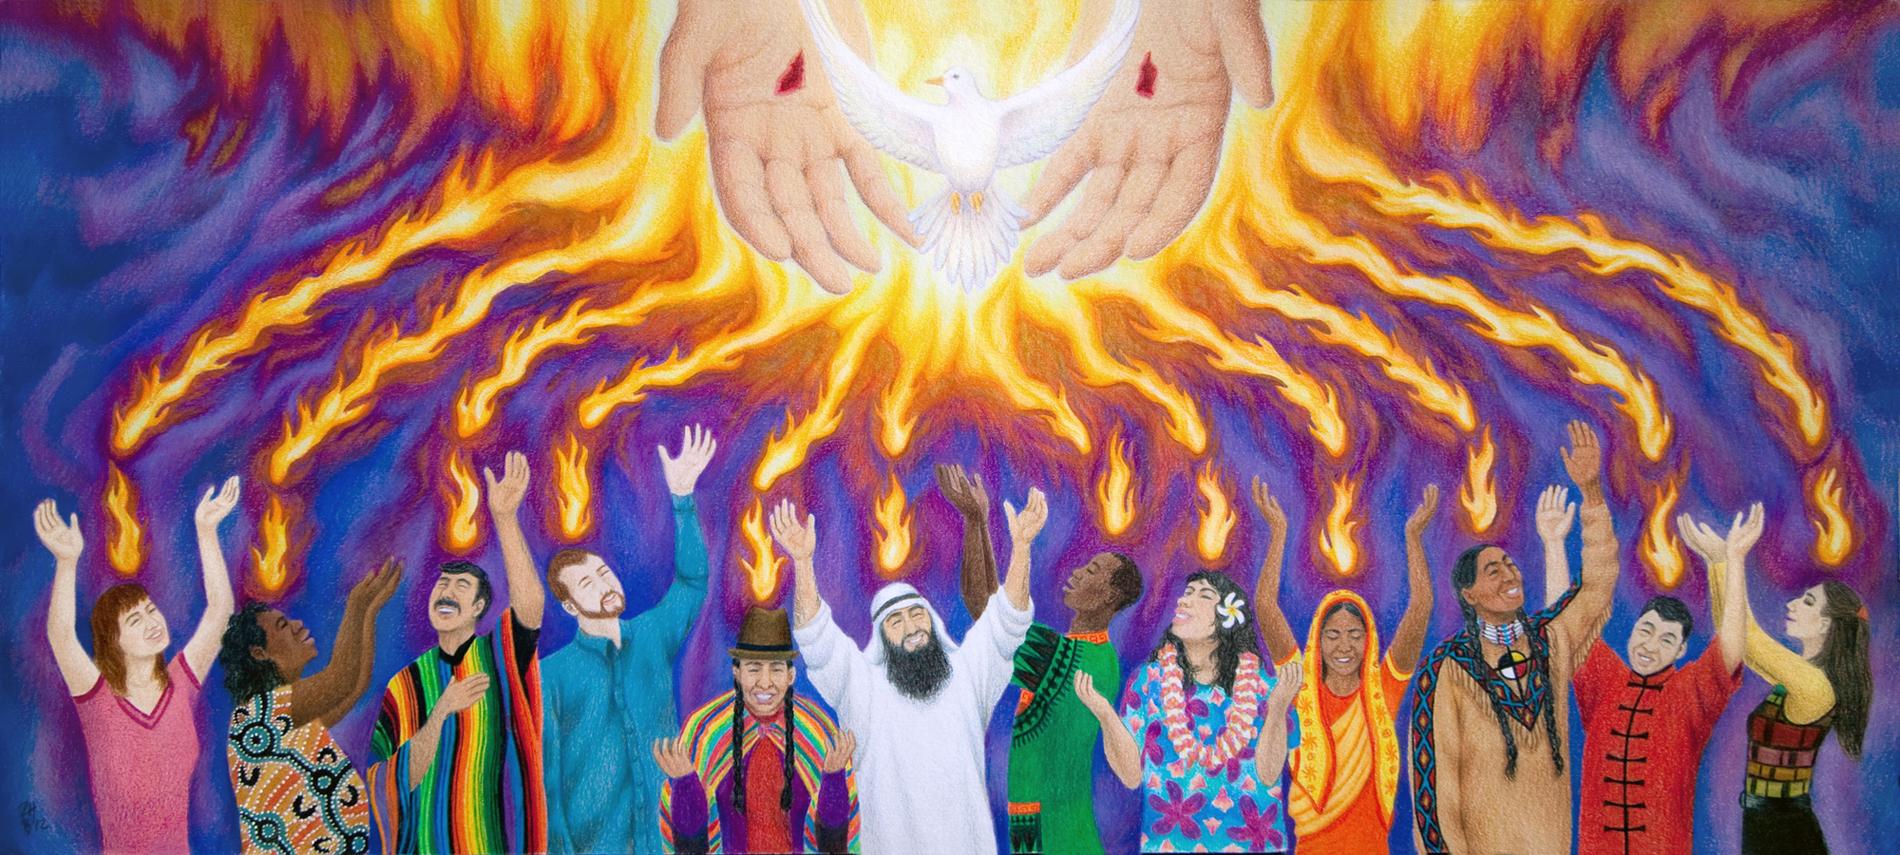 pentecost_web1.jpg